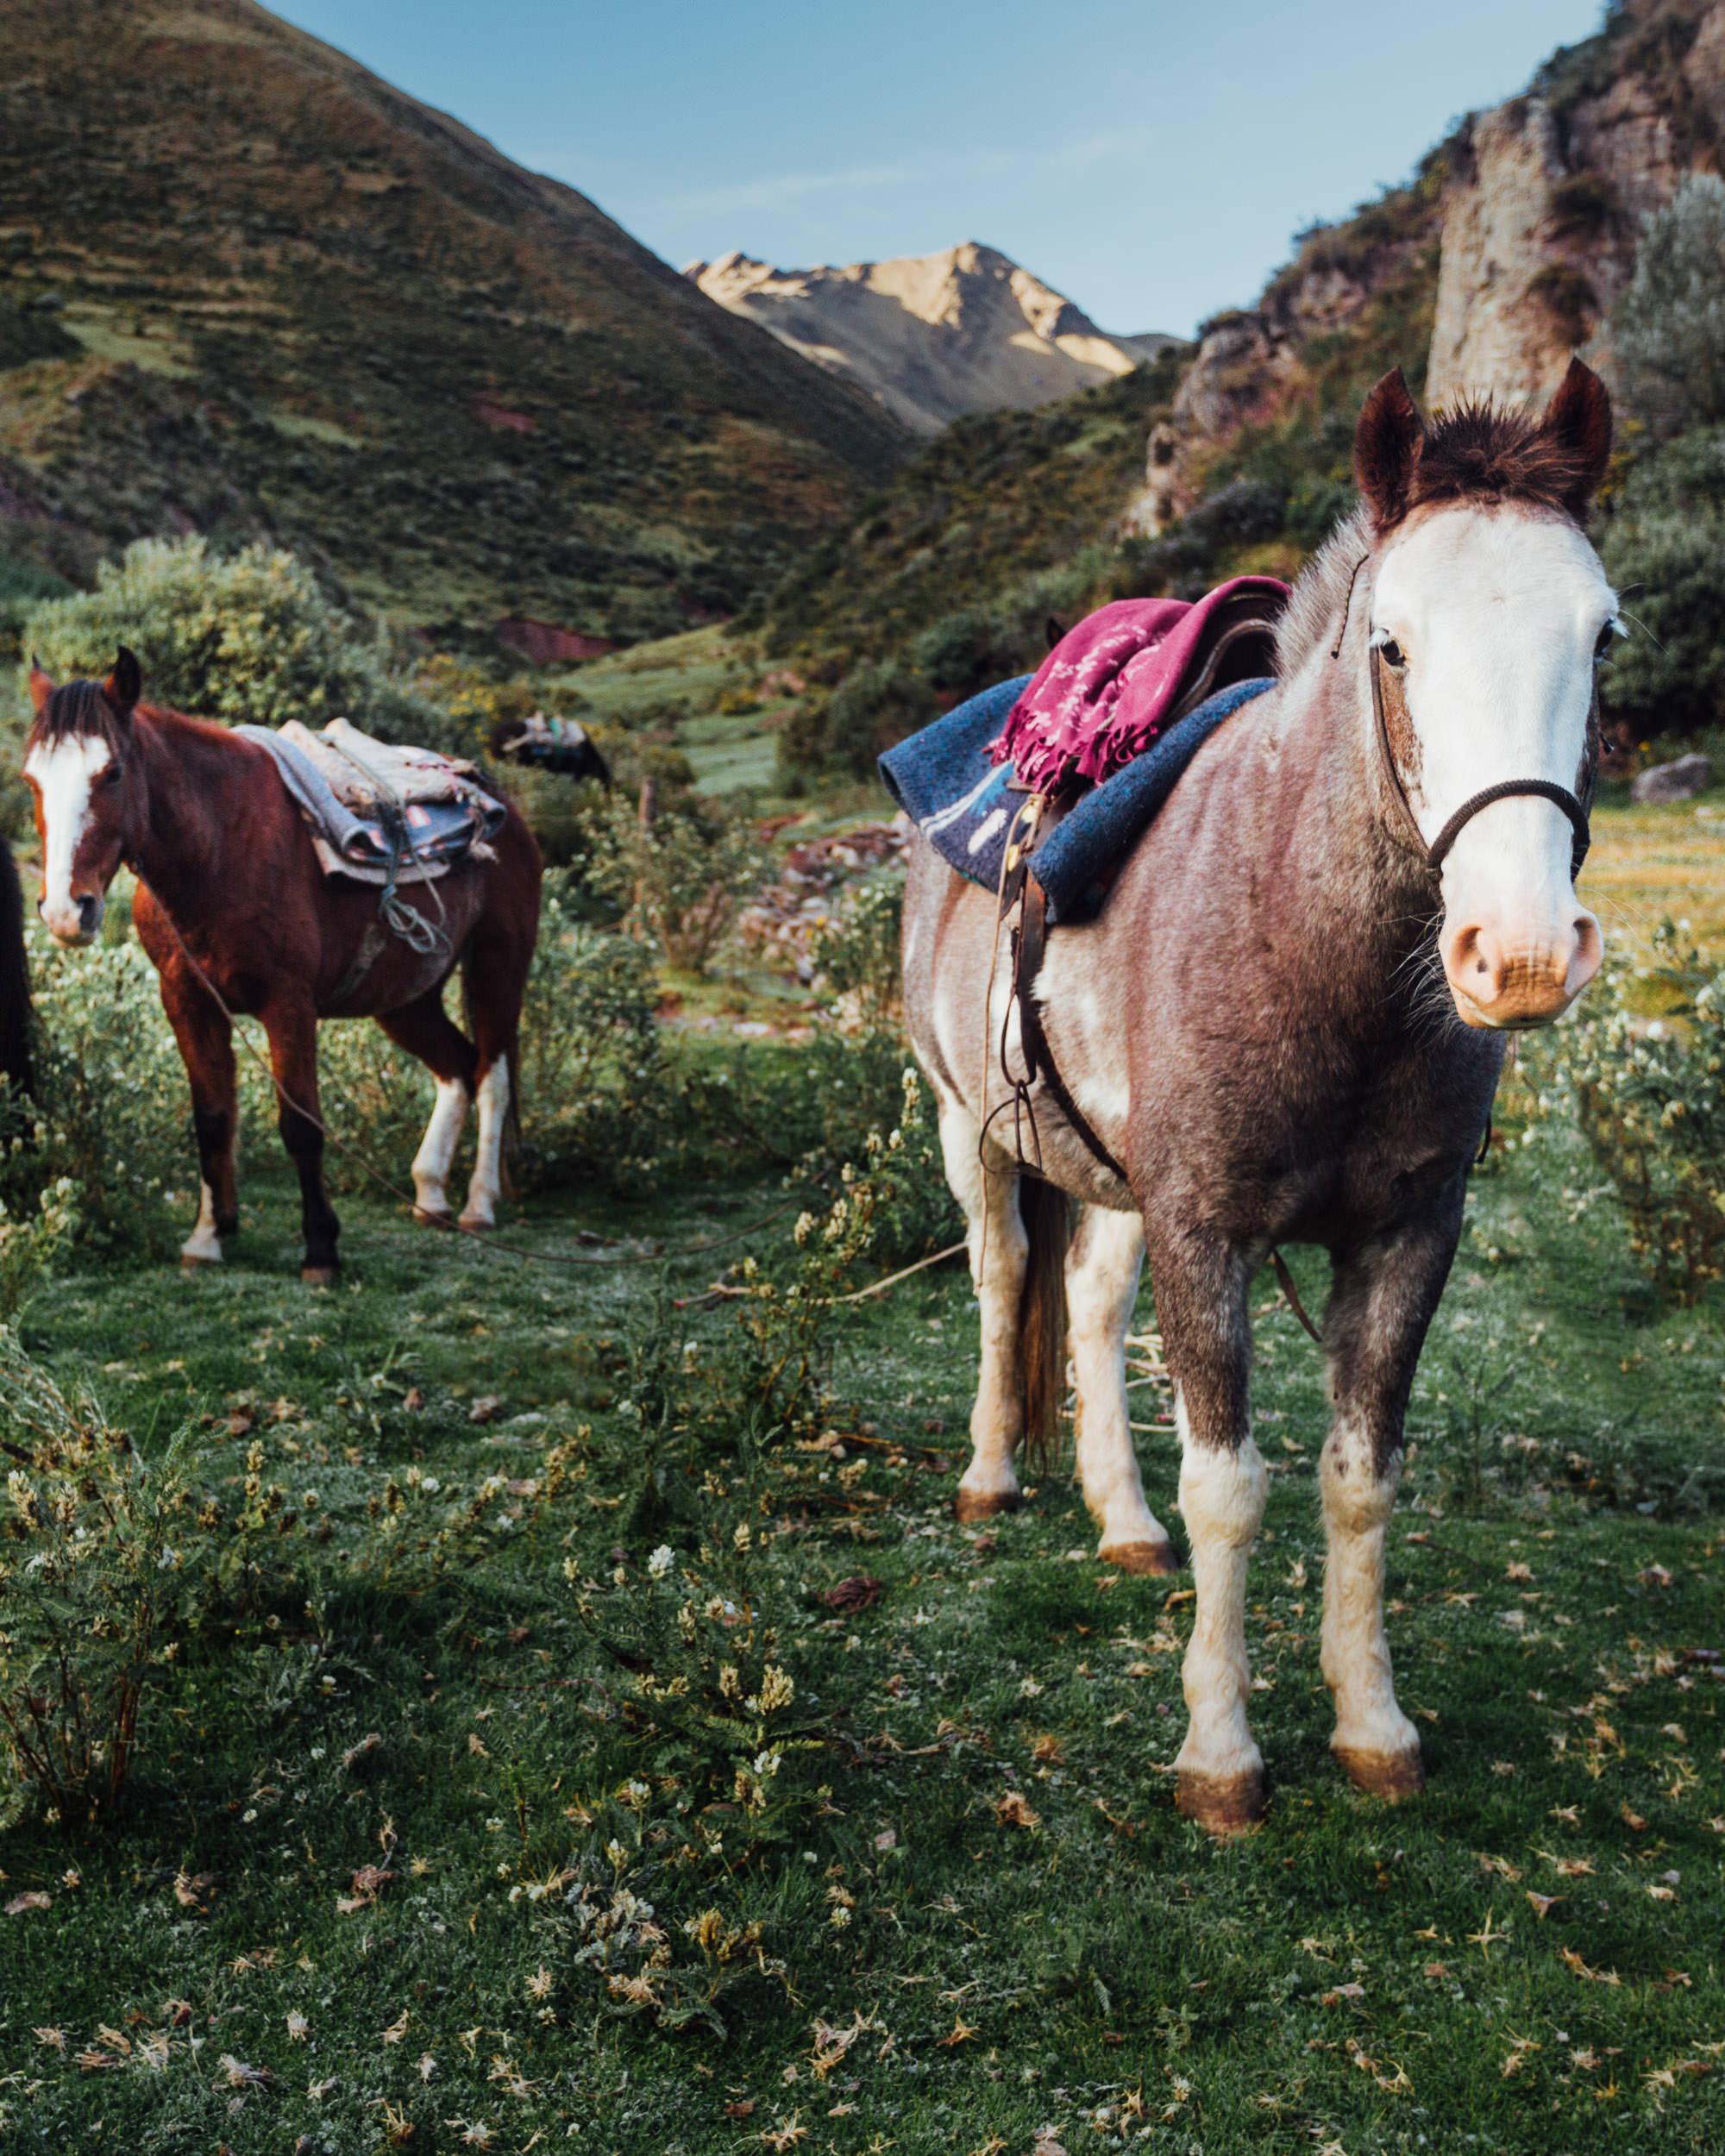 Porters Horses on Trek to Machu Picchu